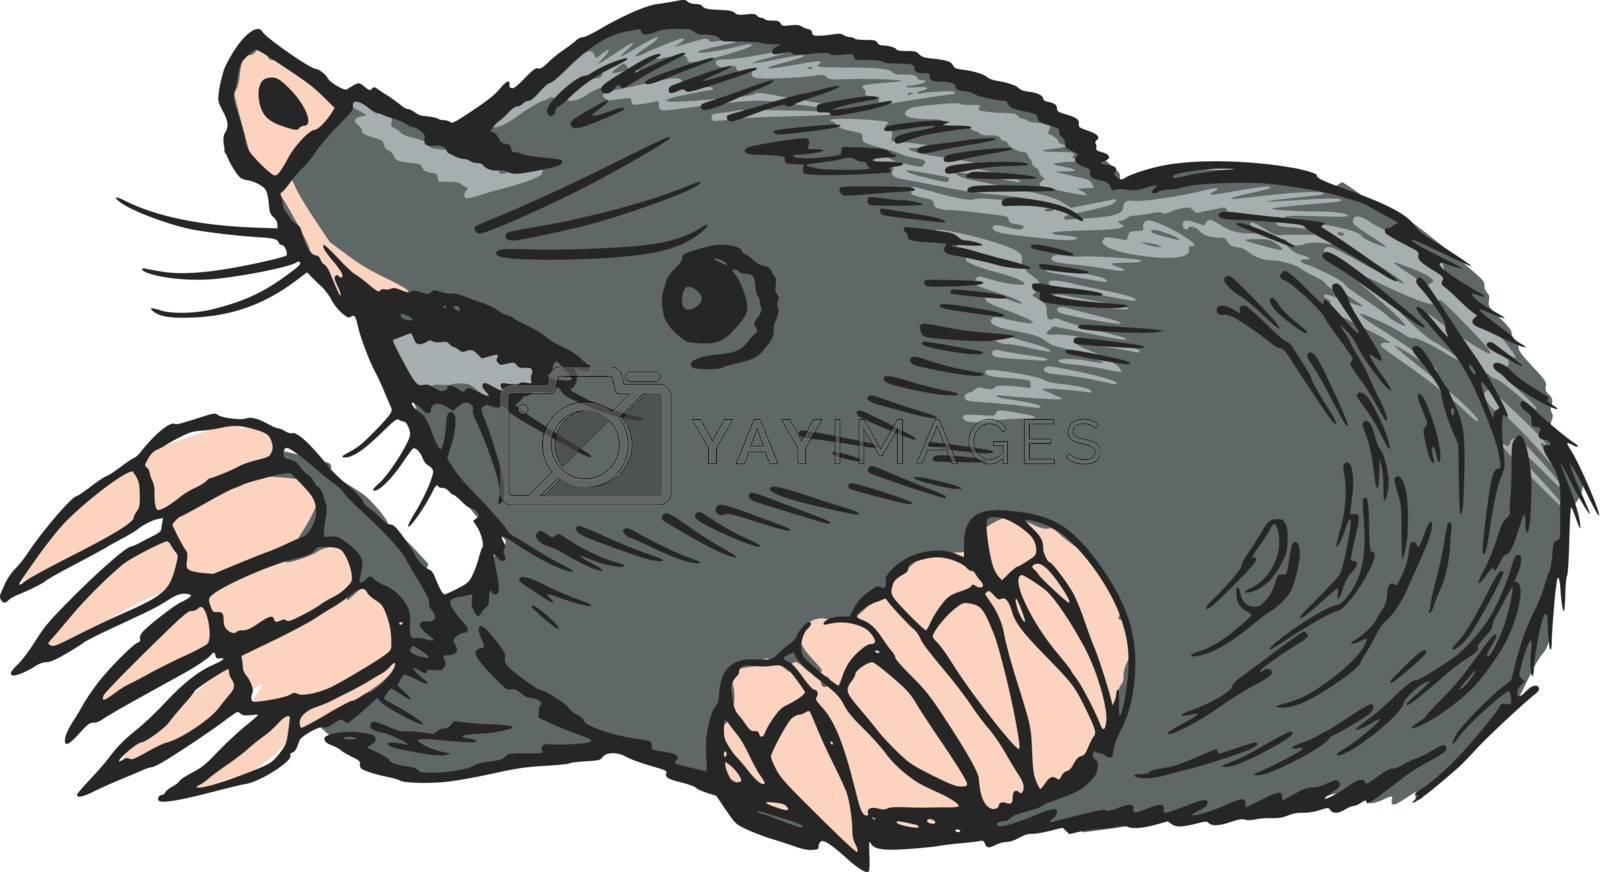 hand drawn, sketch, cartoon illustration of mole